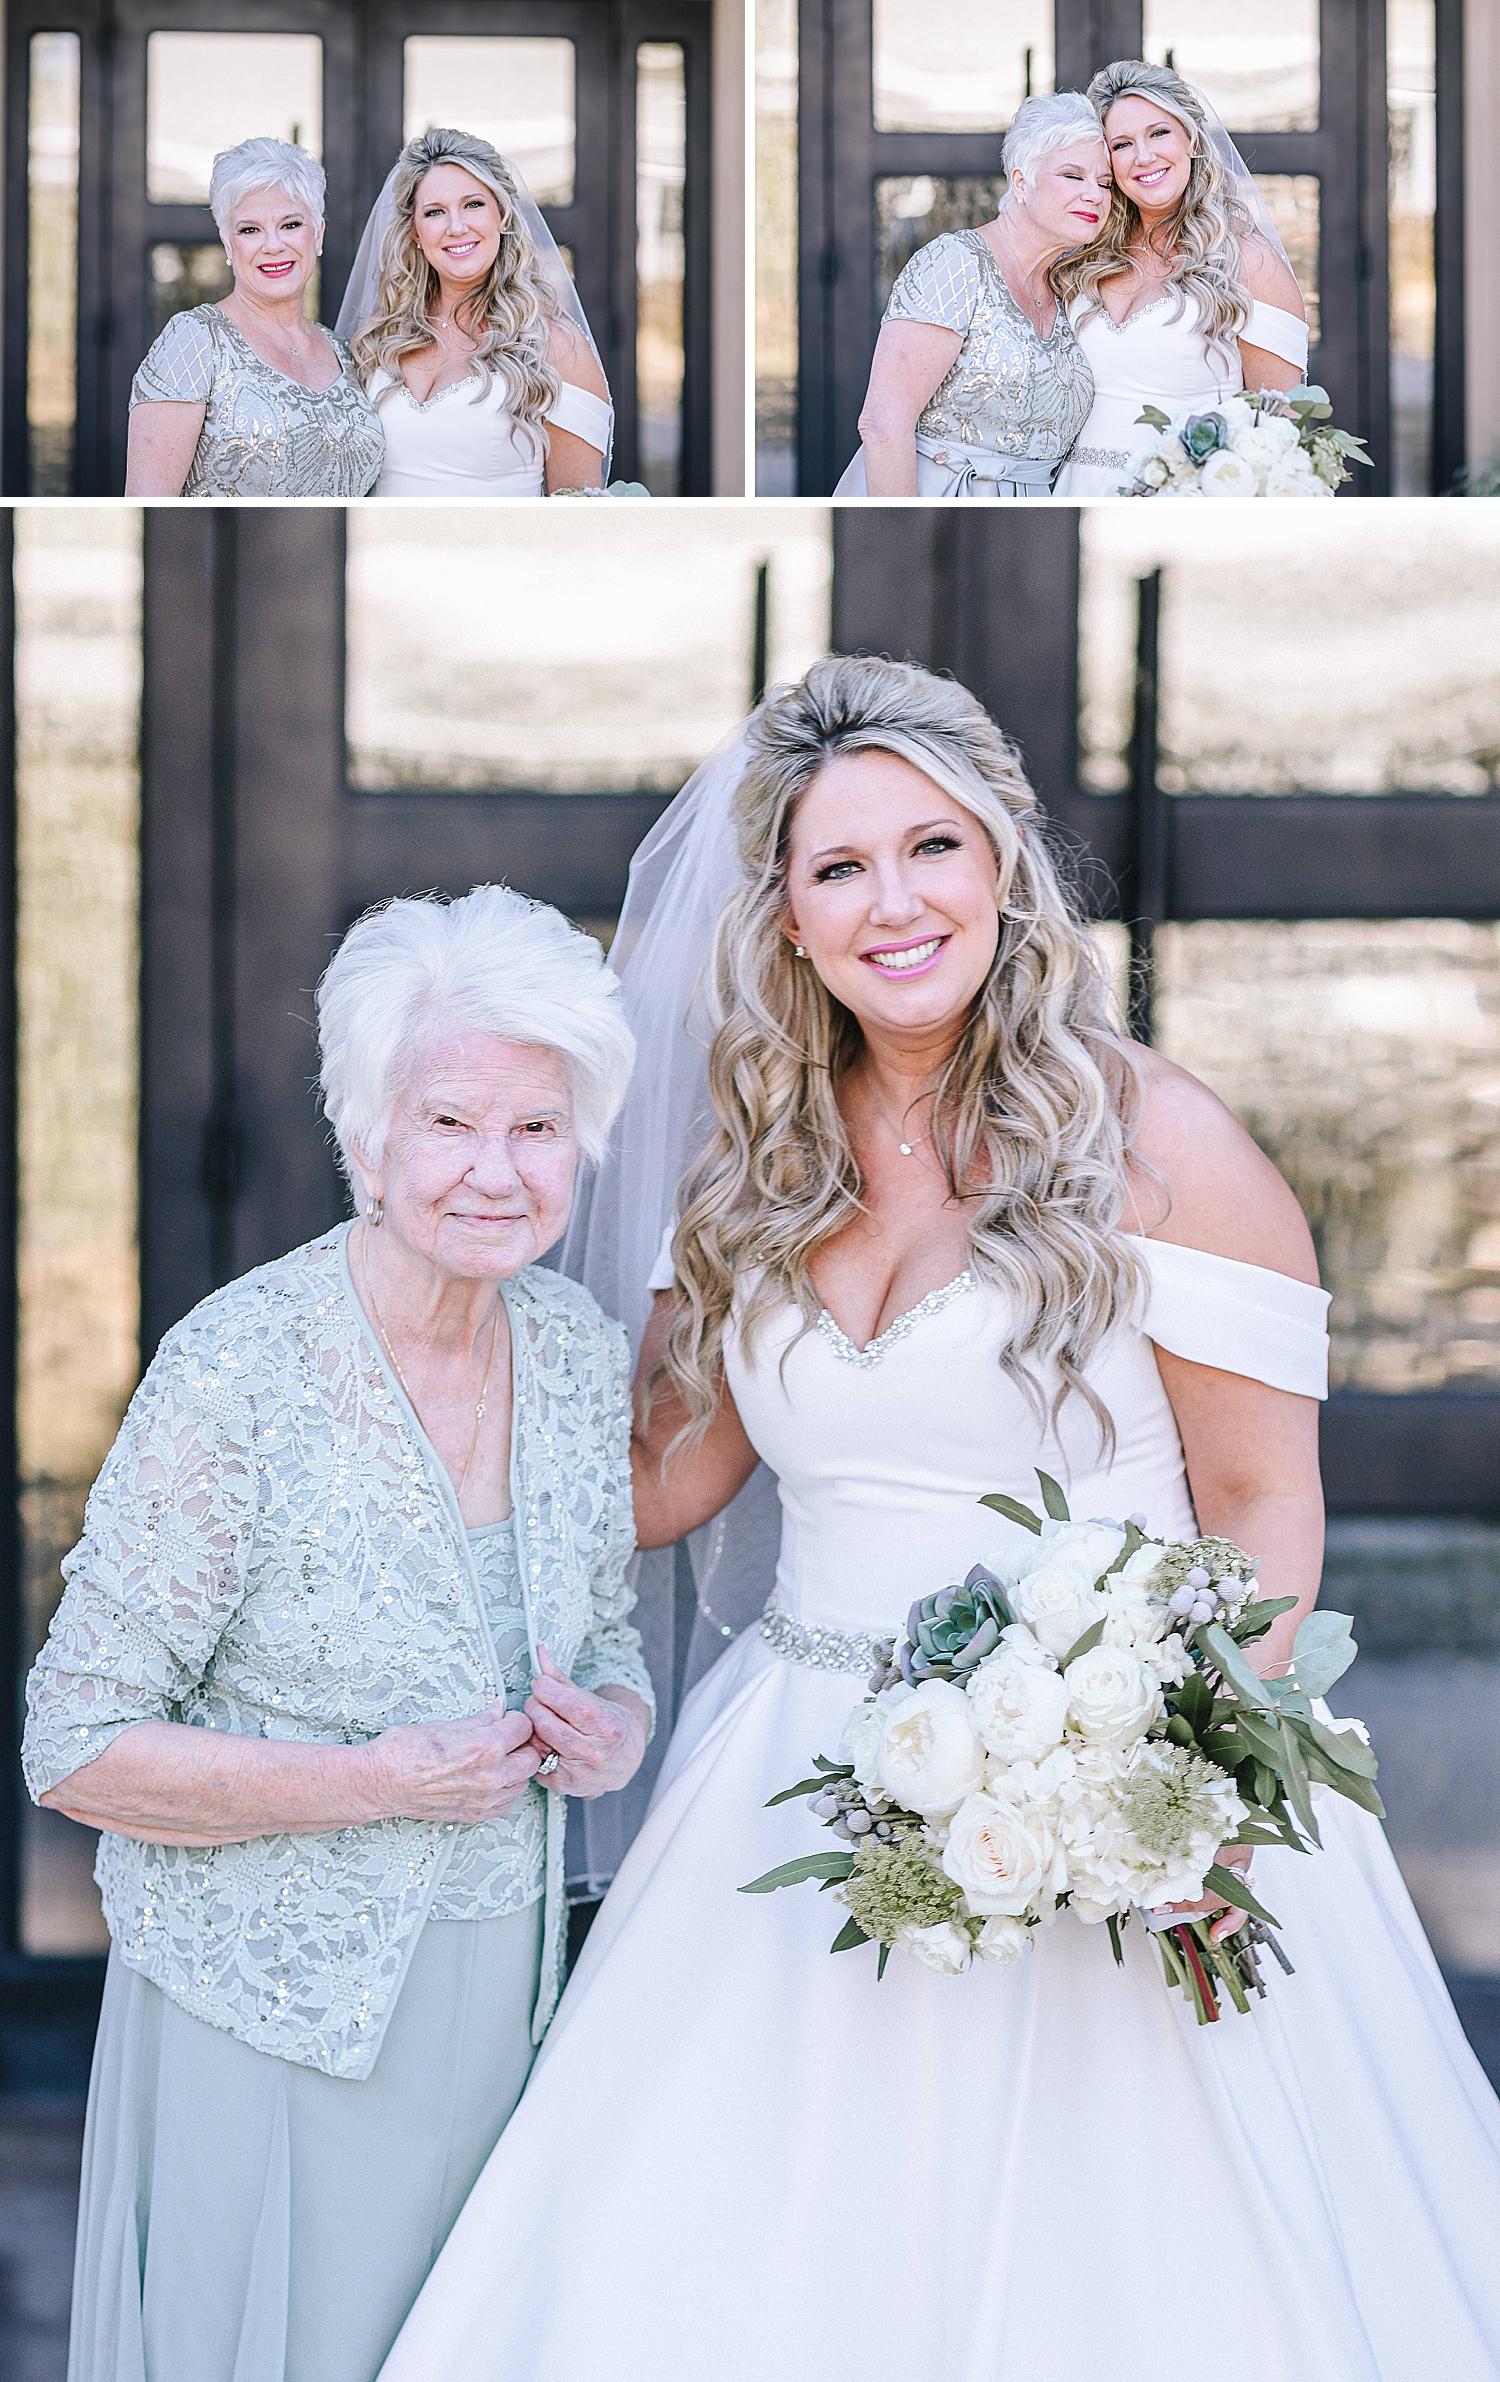 Magnolia-Halle-Wedding-San-Antonio-Texas-Bride-Grom_0040.jpg